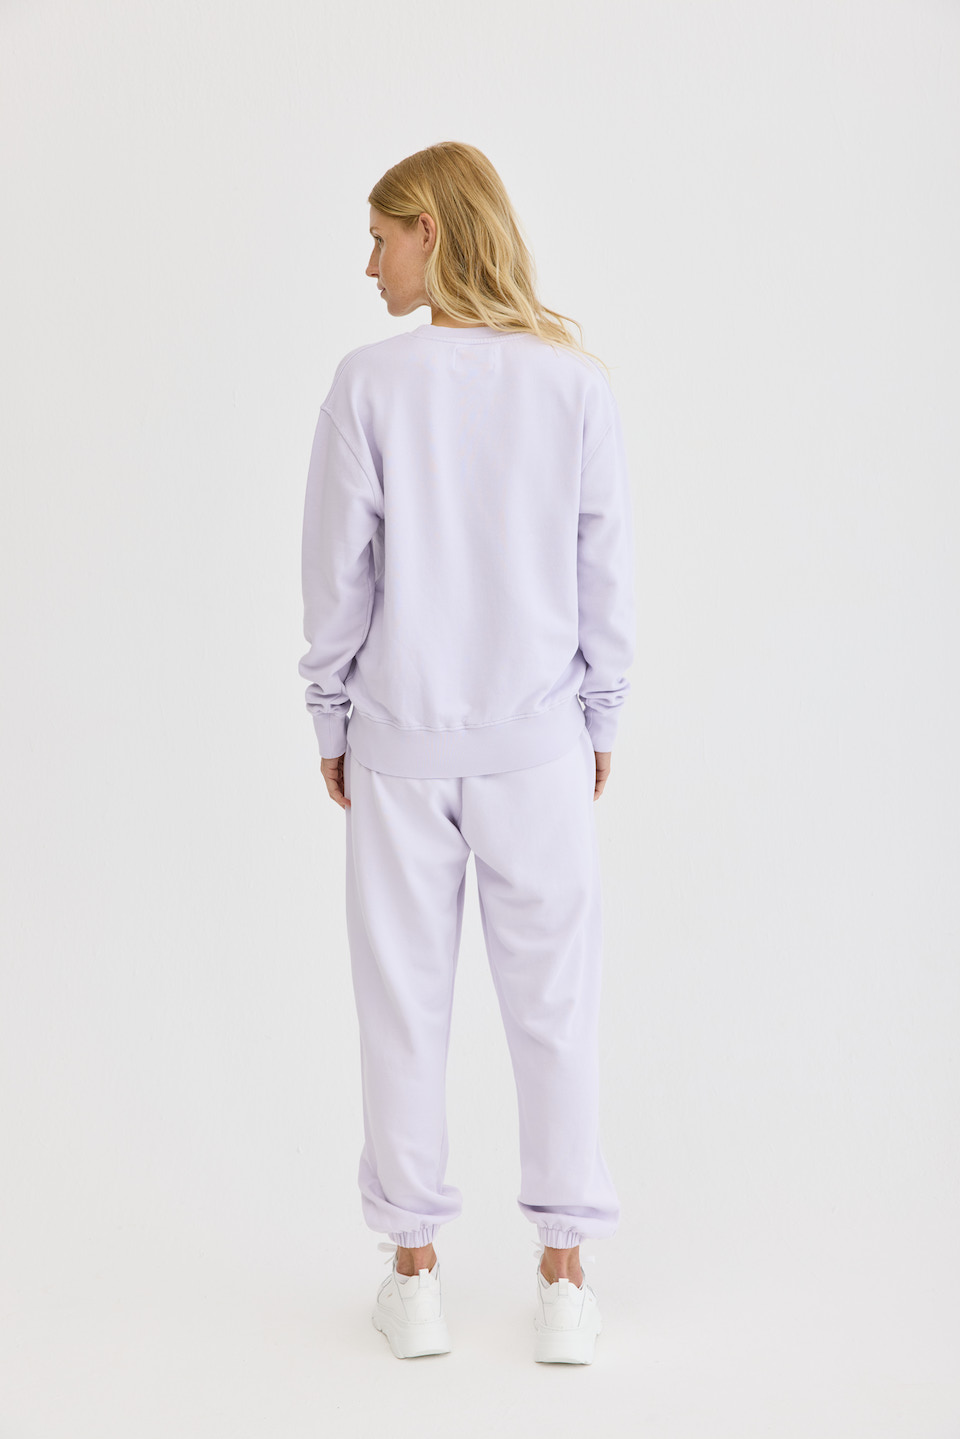 CPH Sweat 4 org. cotton lavender - alternative 1